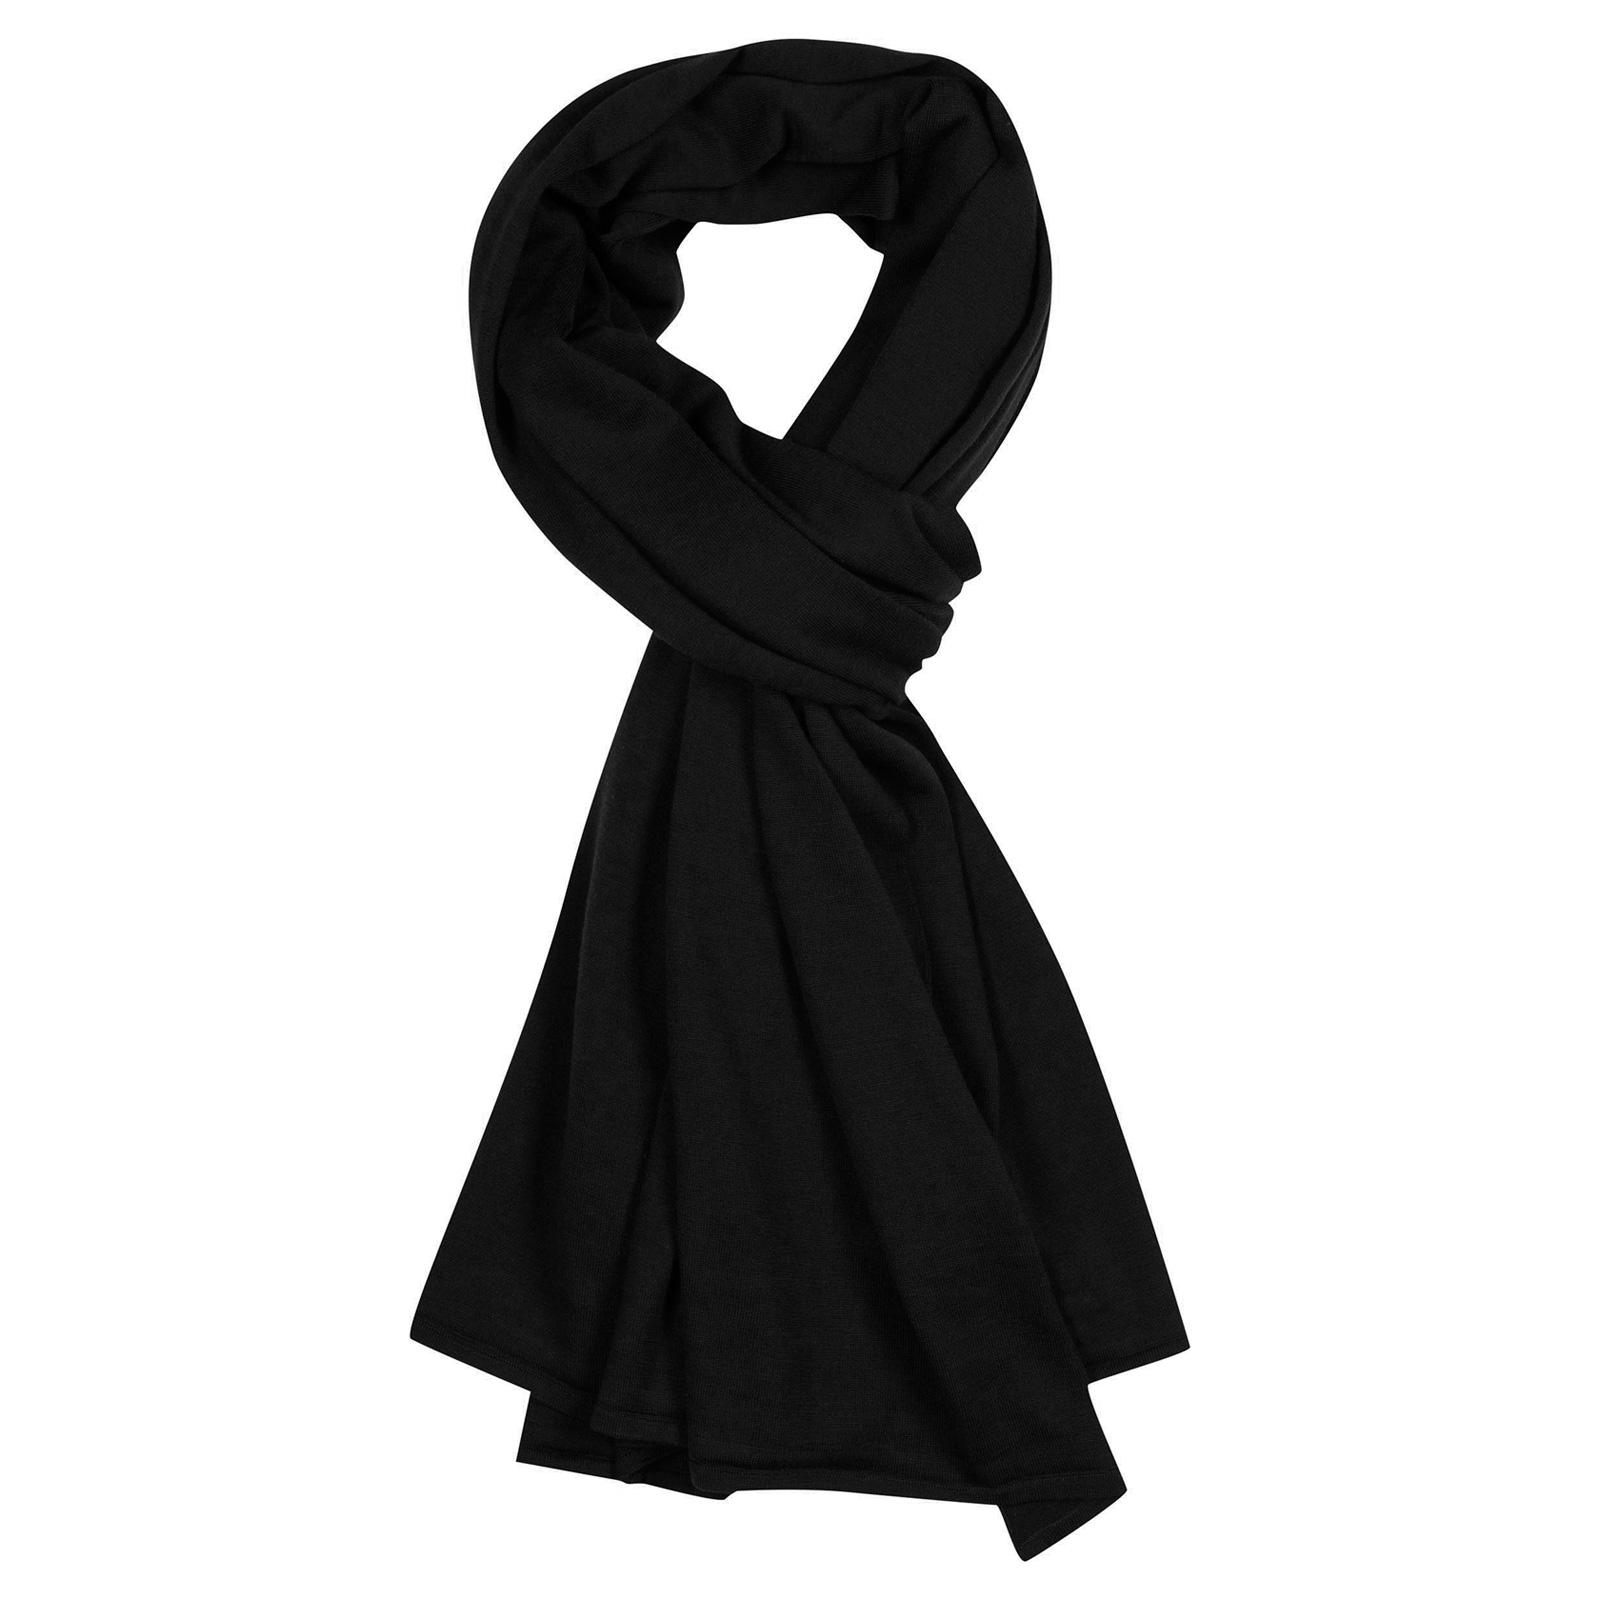 John Smedley wings Merino Wool Shawl in Black-ONE